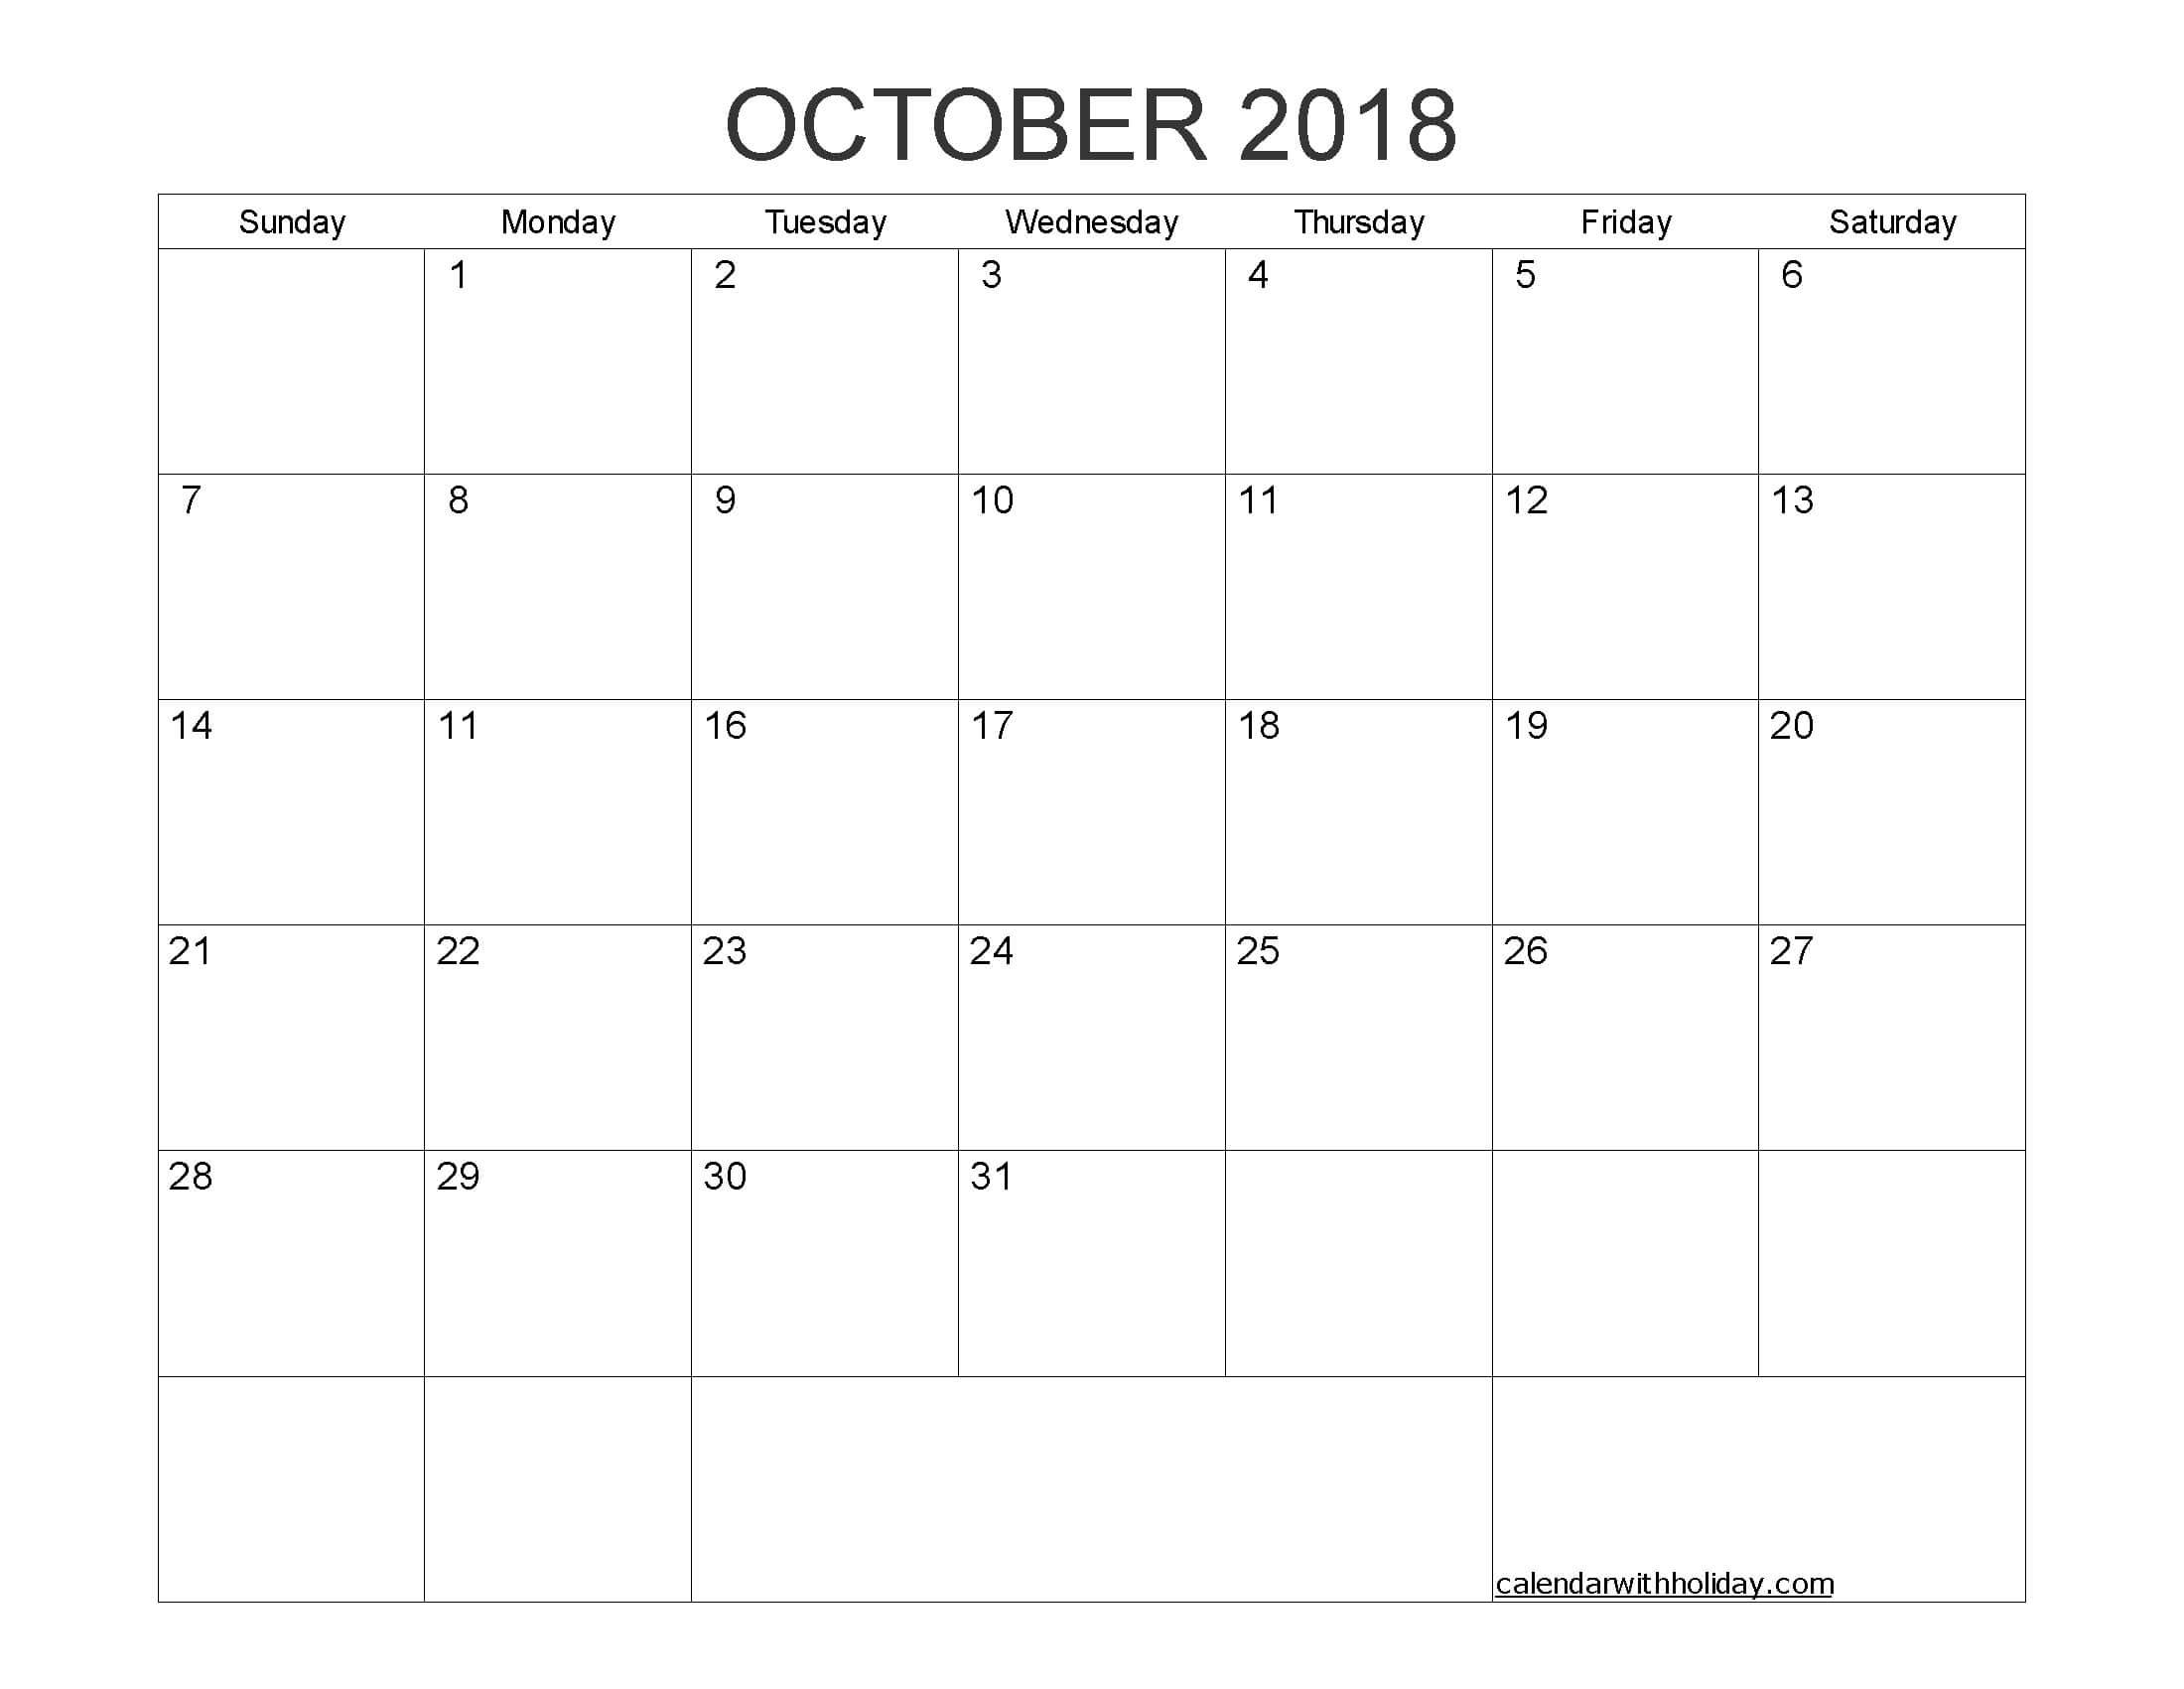 Blank Calendar October 2018 Printable 1 Month Calendar Regarding Blank One Month Calendar Template